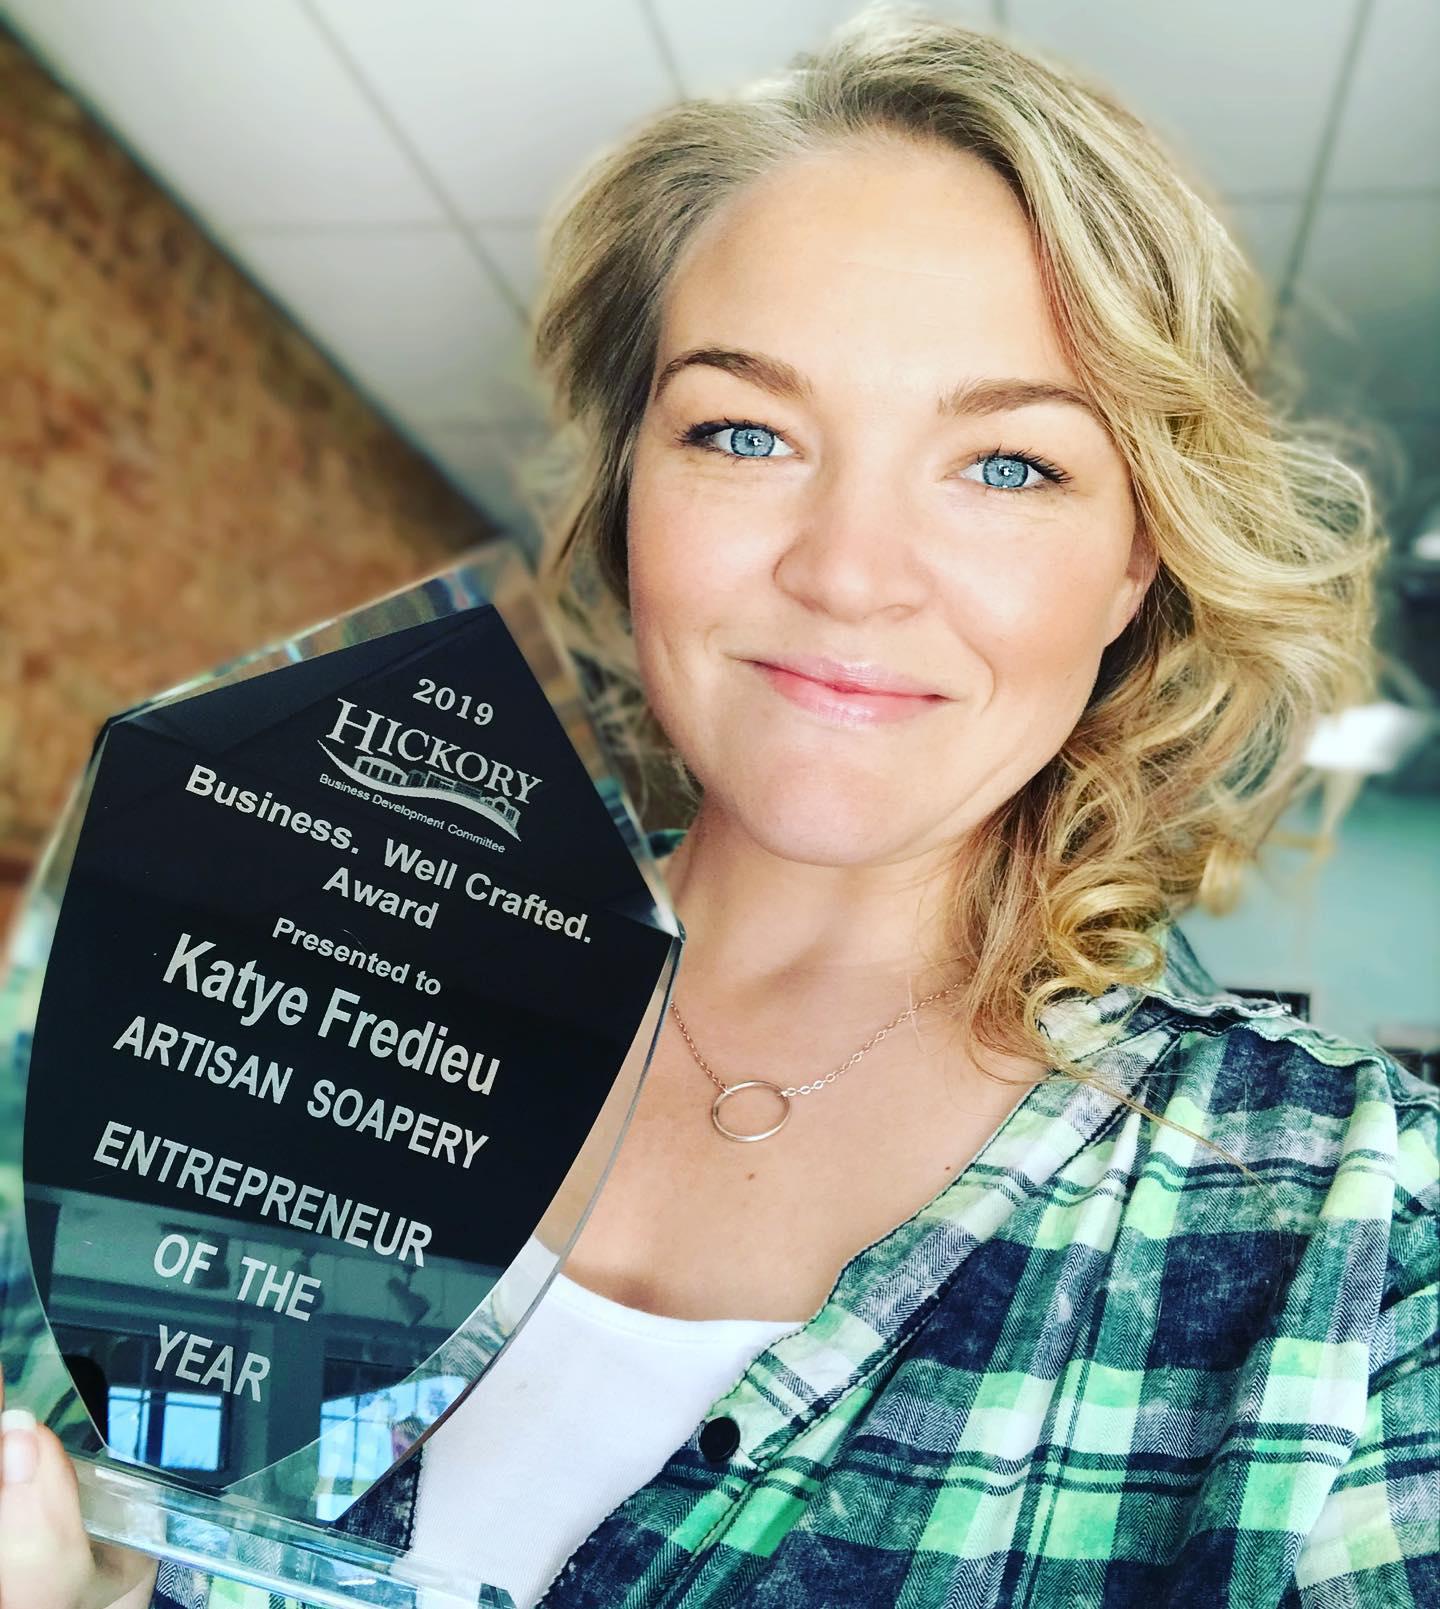 Katye award